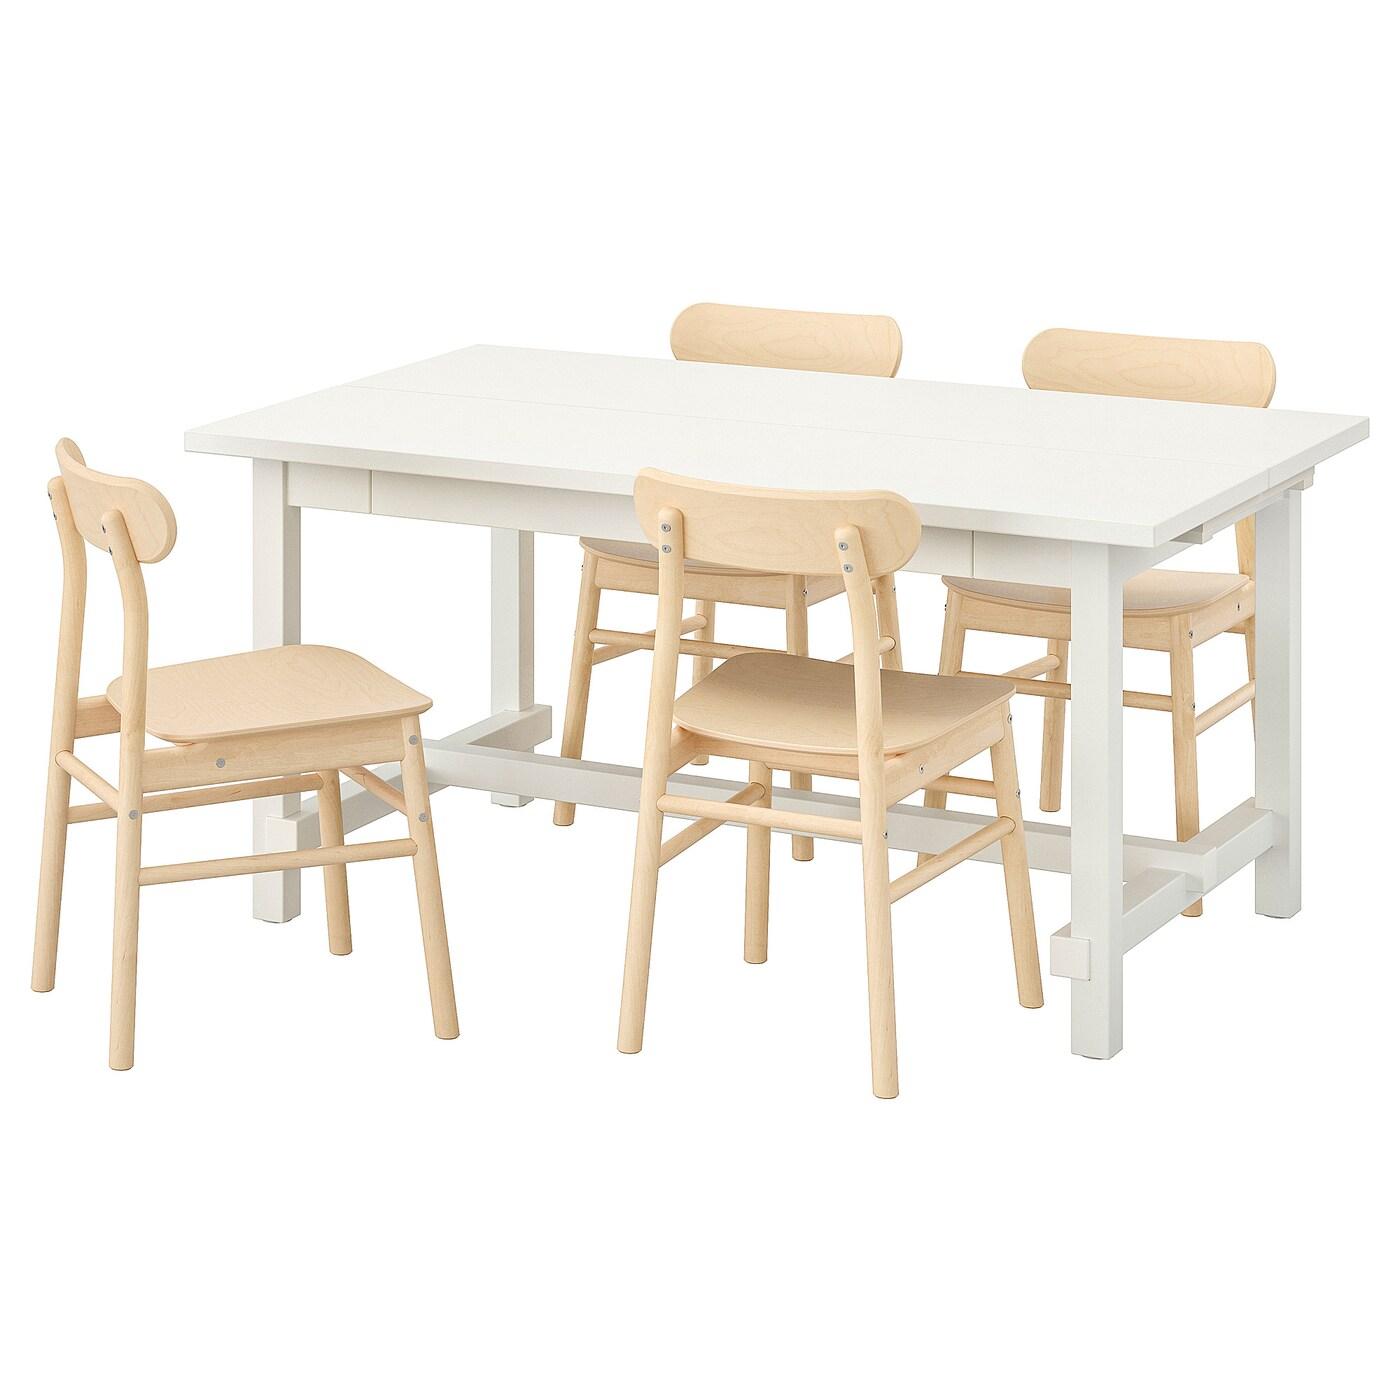 Genial NORDVIKEN / RÖNNINGE Table And 4 Chairs, White, Birch